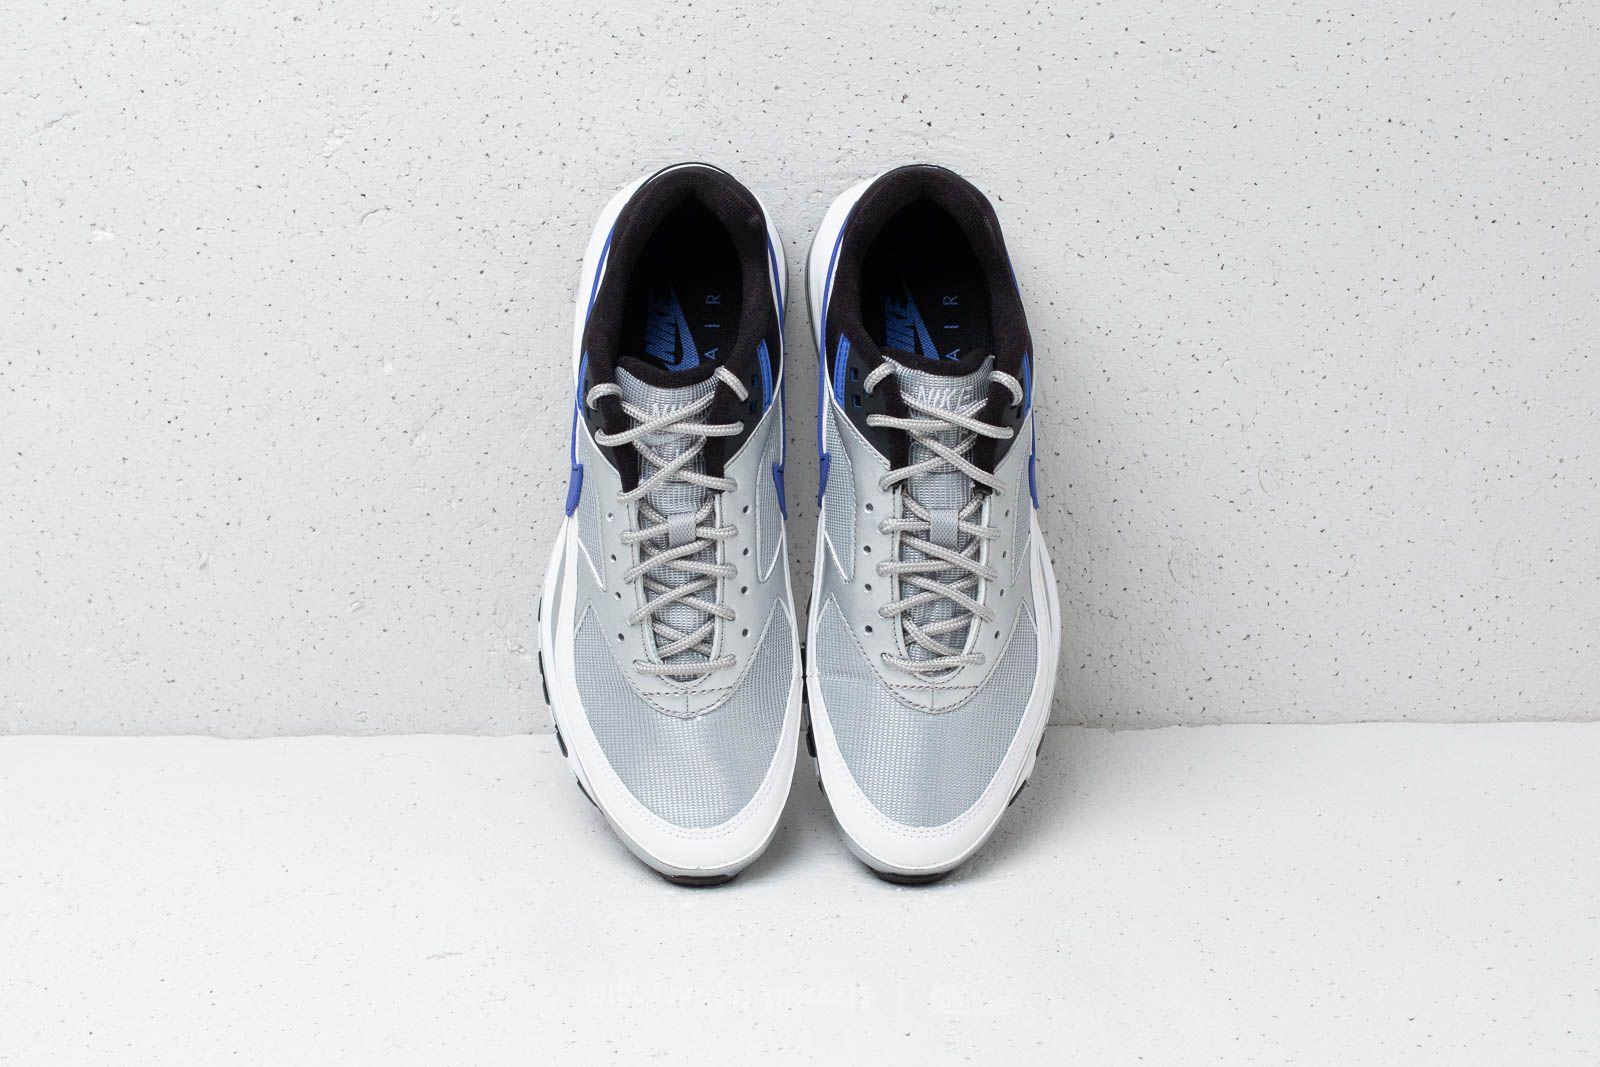 Nike Air Max 97BW Deep Royal BlueBlack